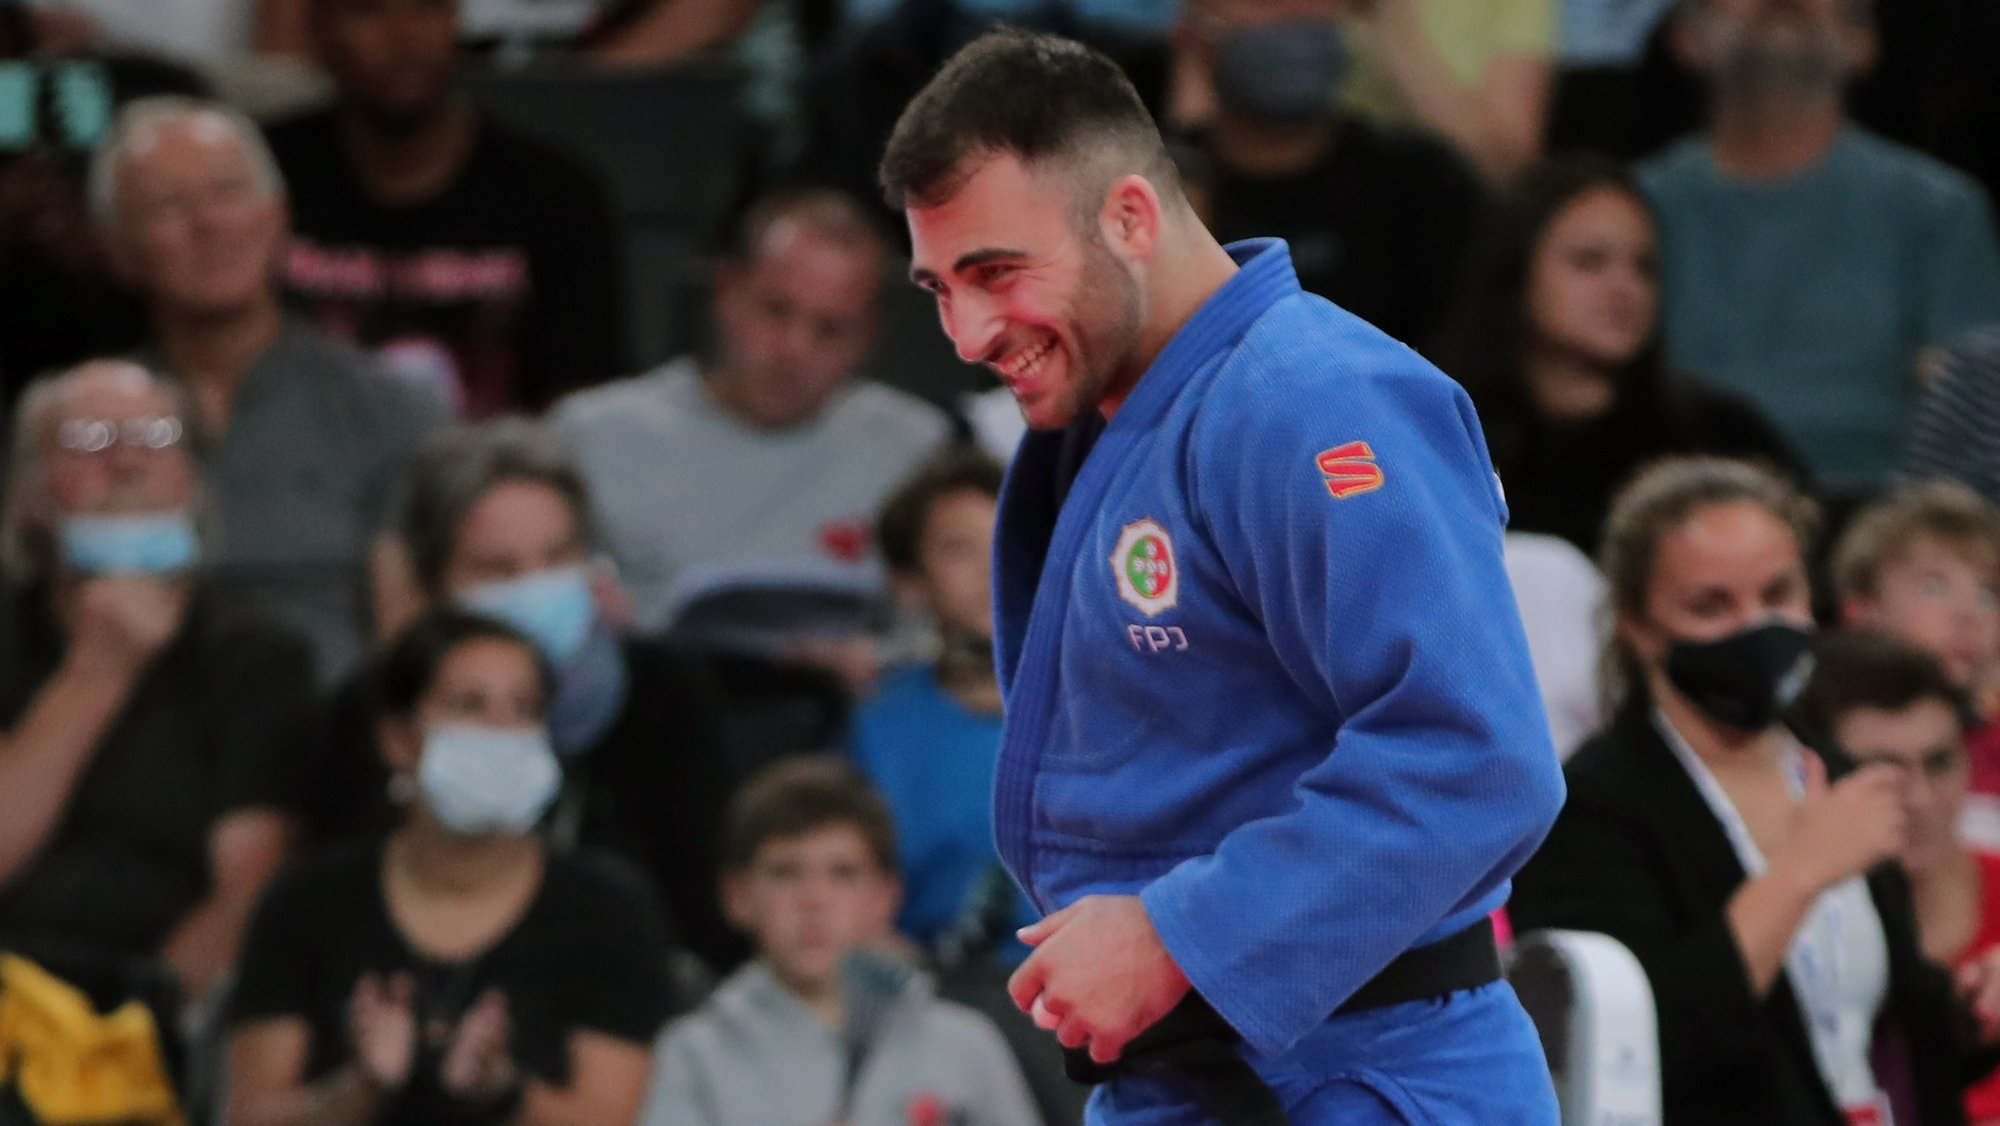 epa09528756 Anri Egutidze of Portugal reacts during the men's -90kg category Bronze match at the Paris Grand Slam judo tournament, in Paris, France, 17 October 2021.  EPA/CHRISTOPHE PETIT TESSON